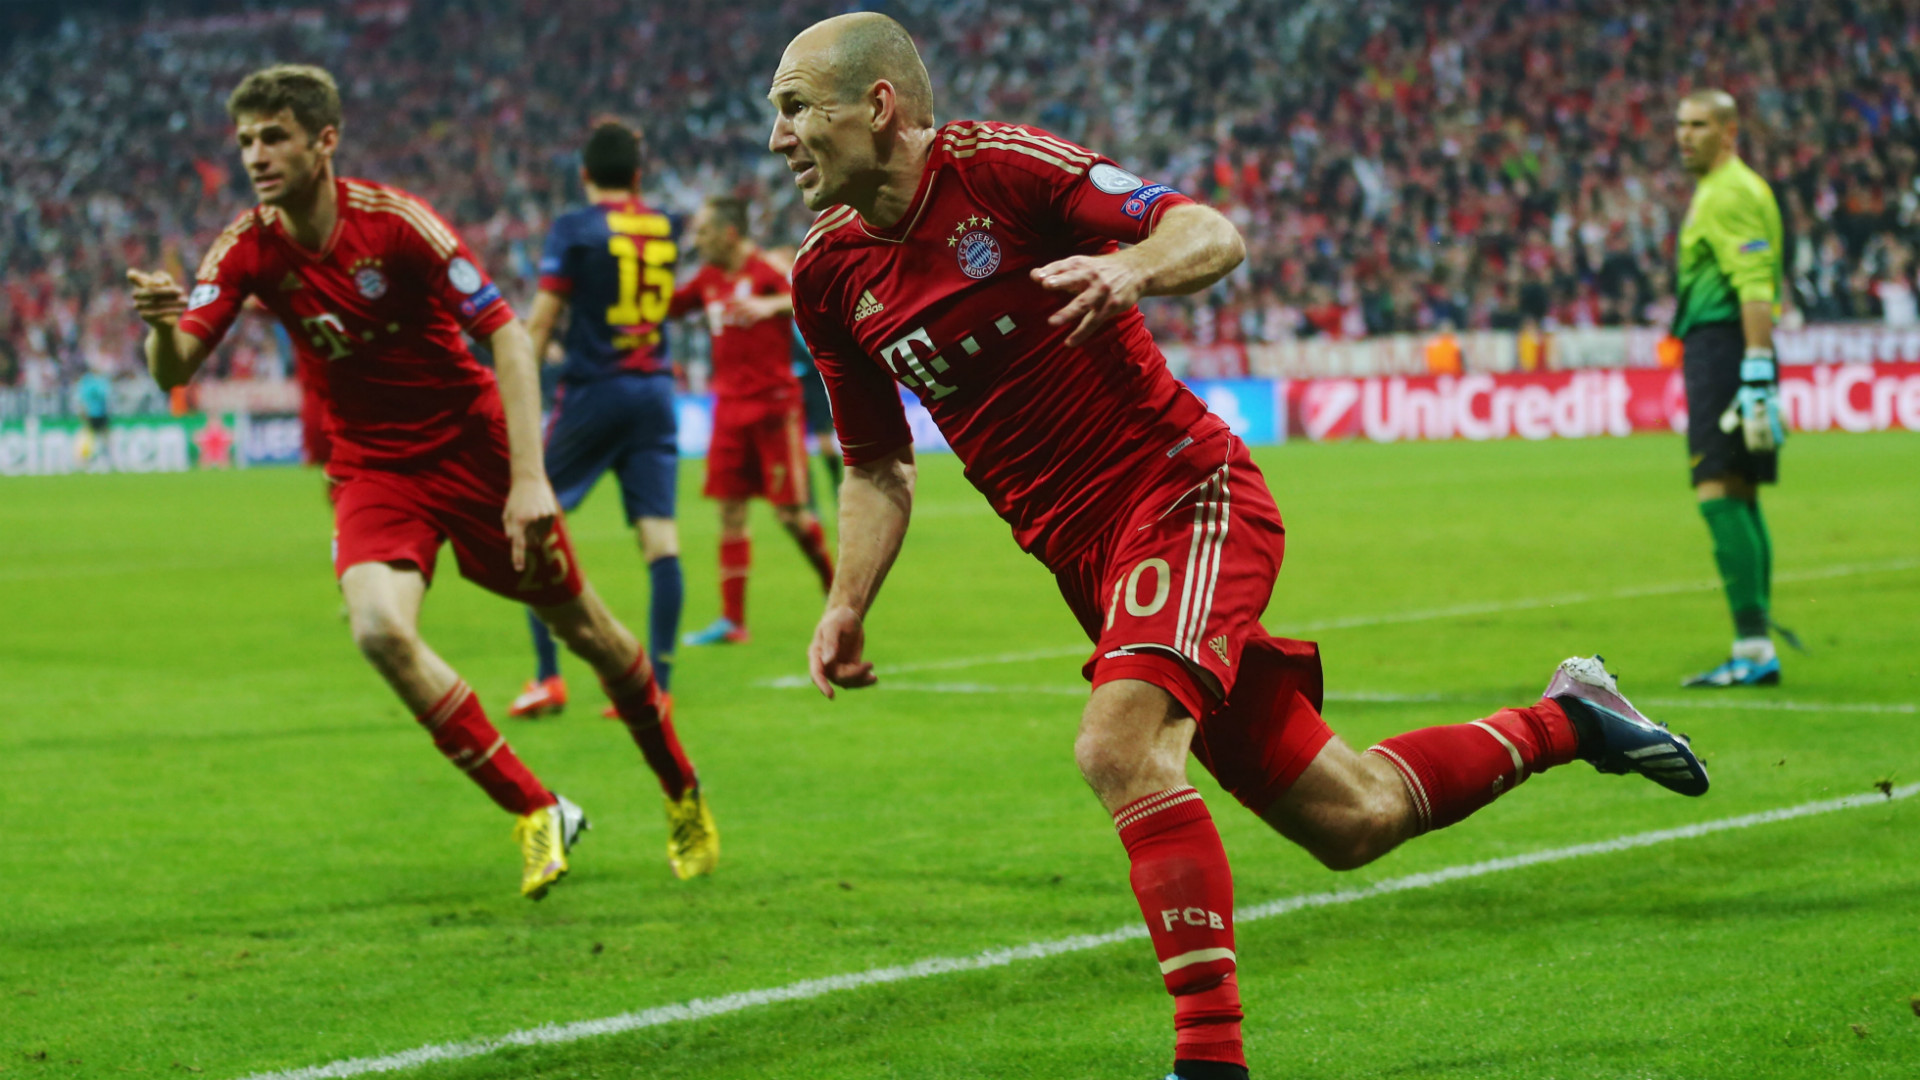 Bayern Munich 3-1 Hannover